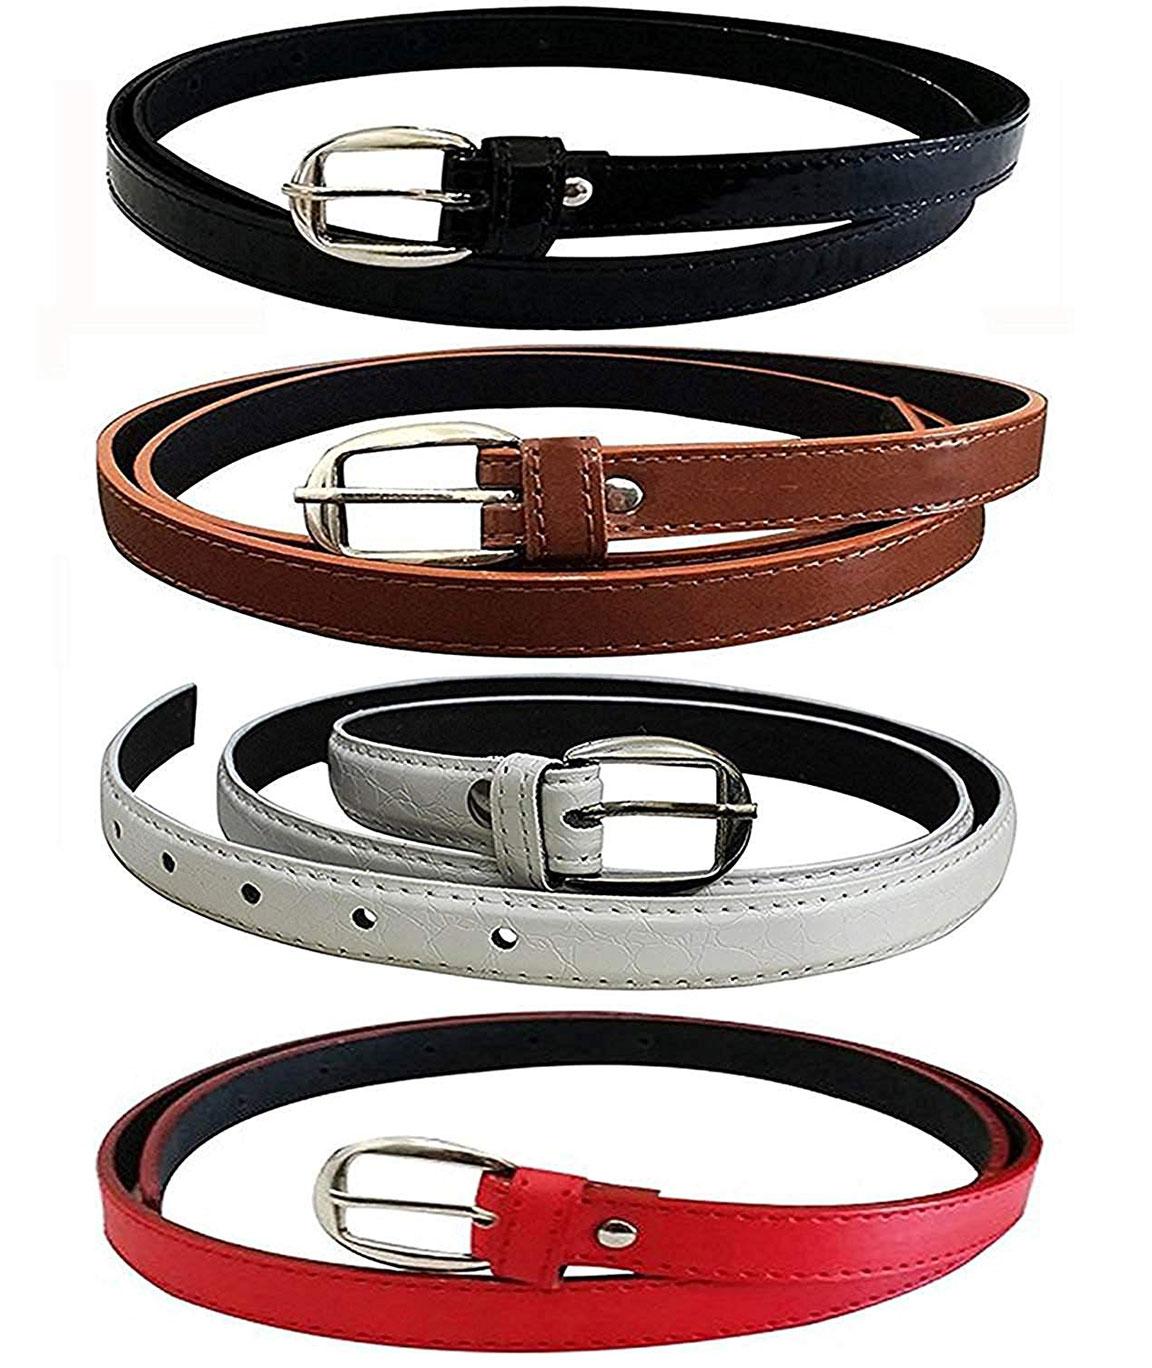 DN Enterprises Latest Design Girls PU Leather Belt/Party Wear Belt For Women/Girl…Pack Of 4 (BLK-BRWN-RED-WHT)